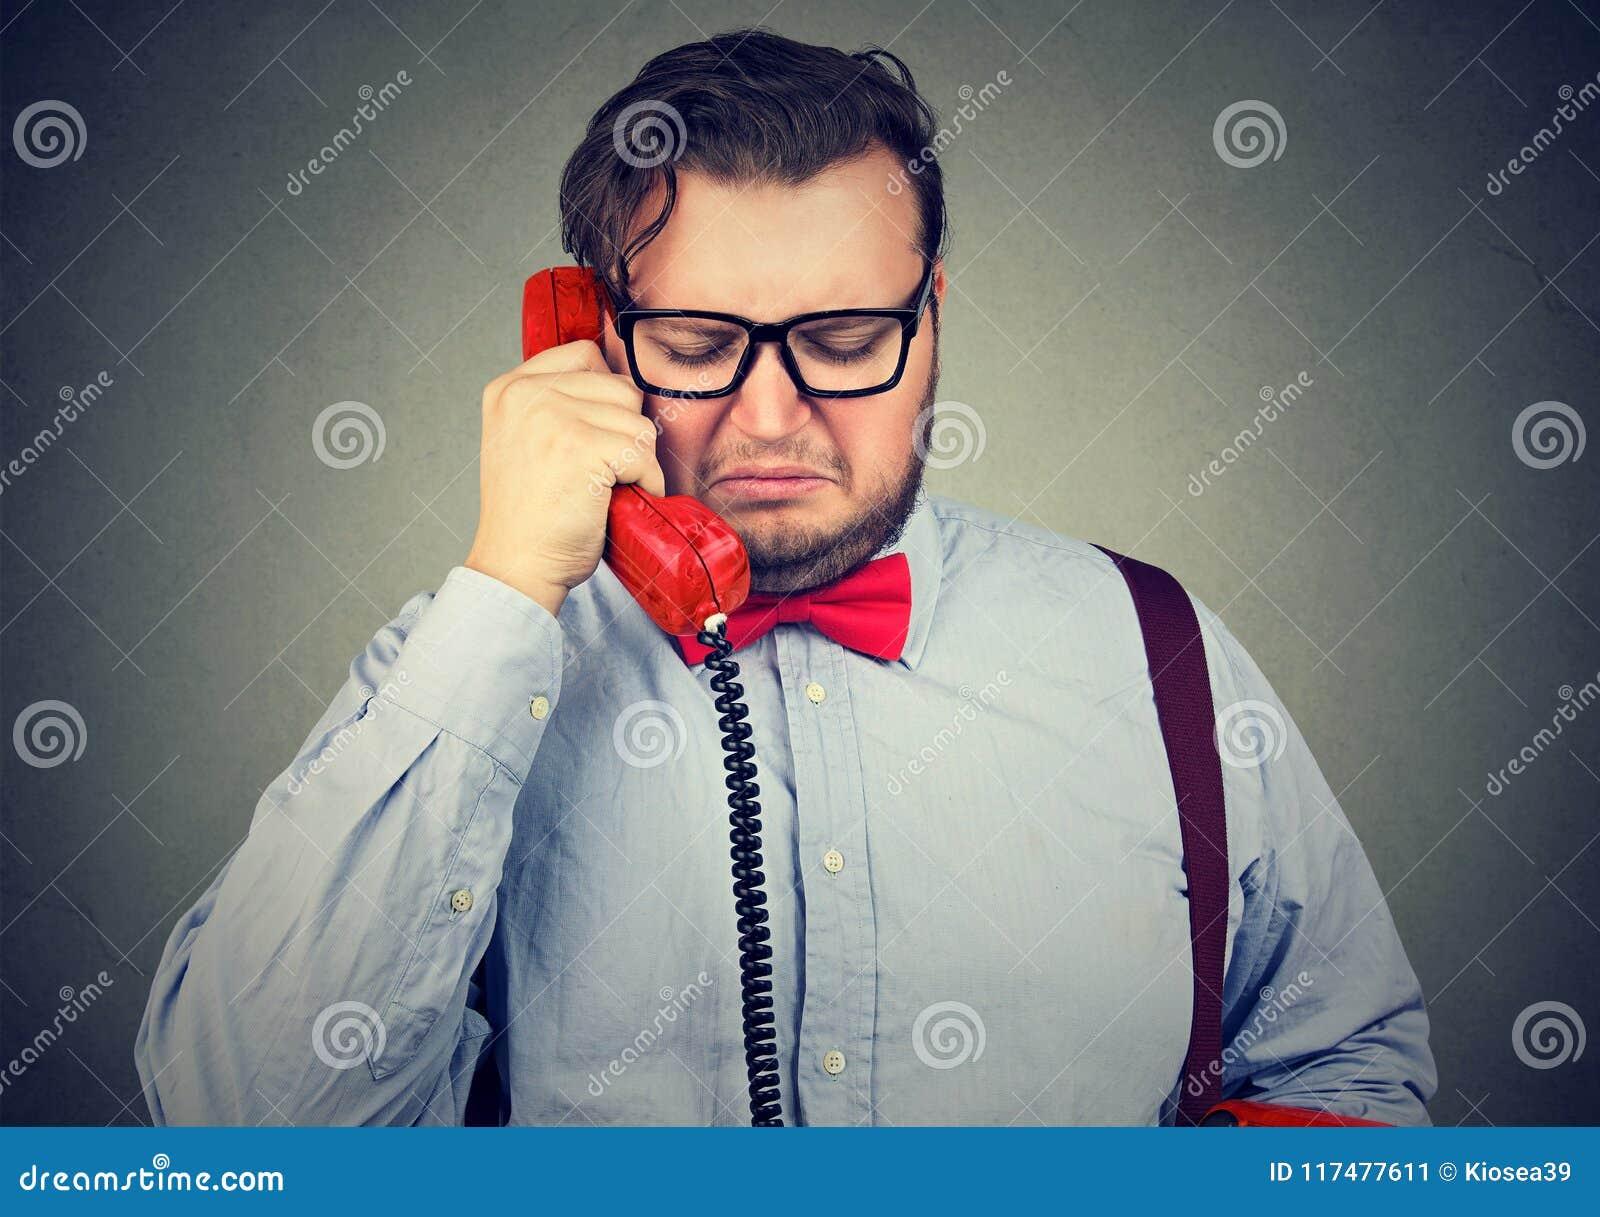 Heartbroken sad man talking on telephone and looking unhappy feeling devastated